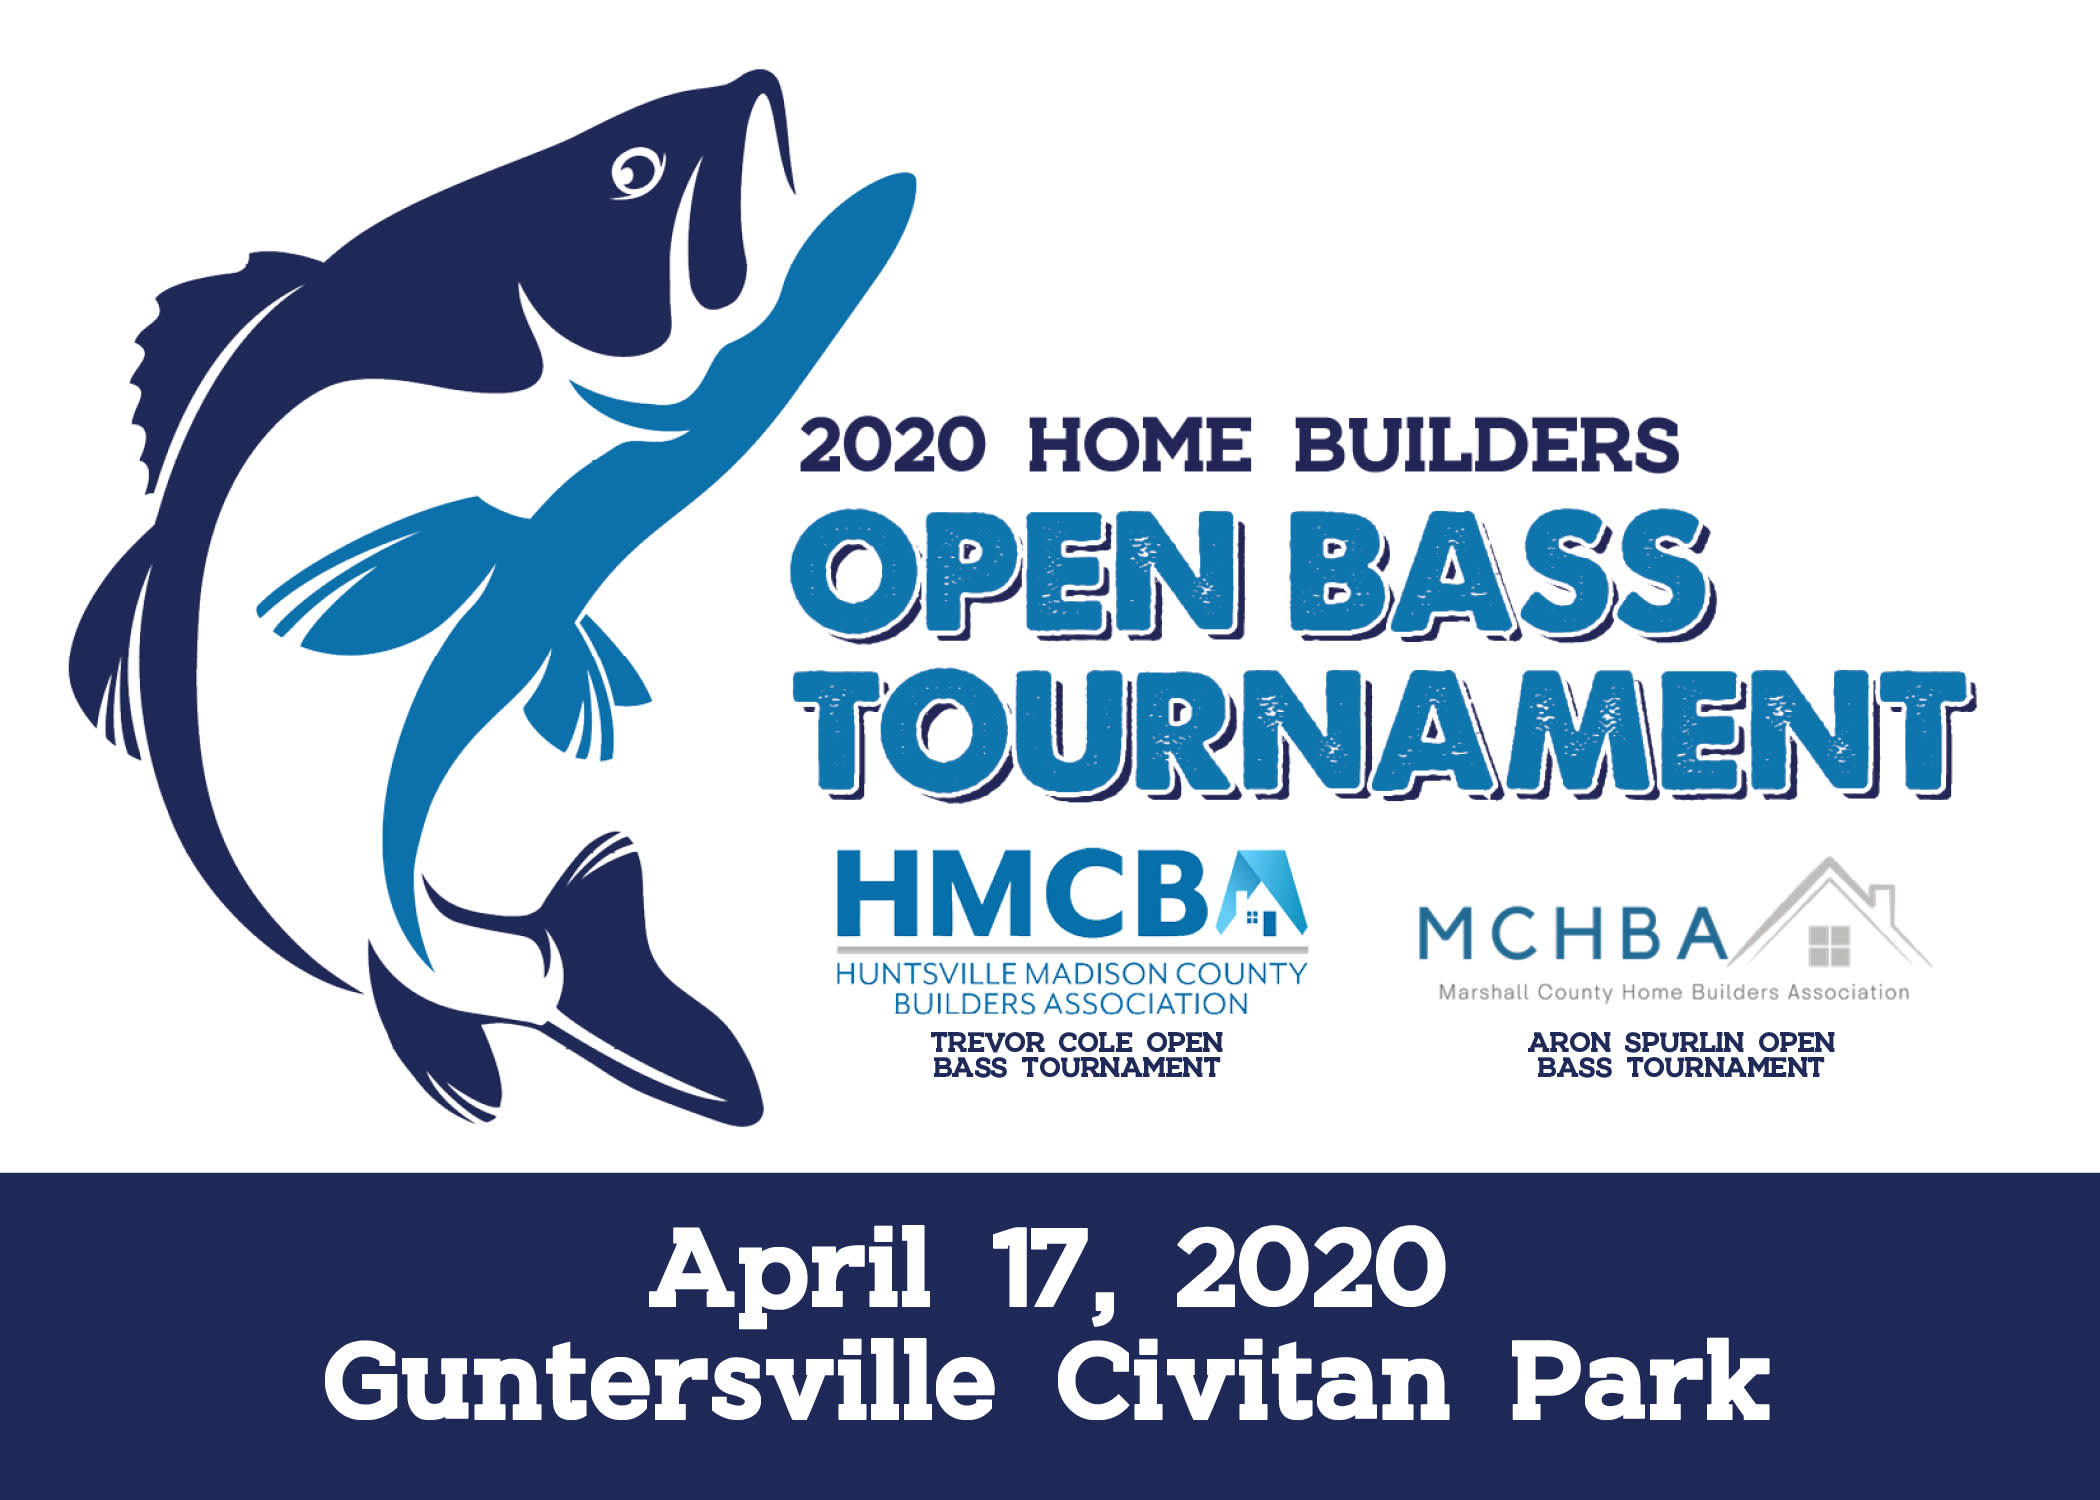 HMCBA (Huntsville Madison County Builders Association)